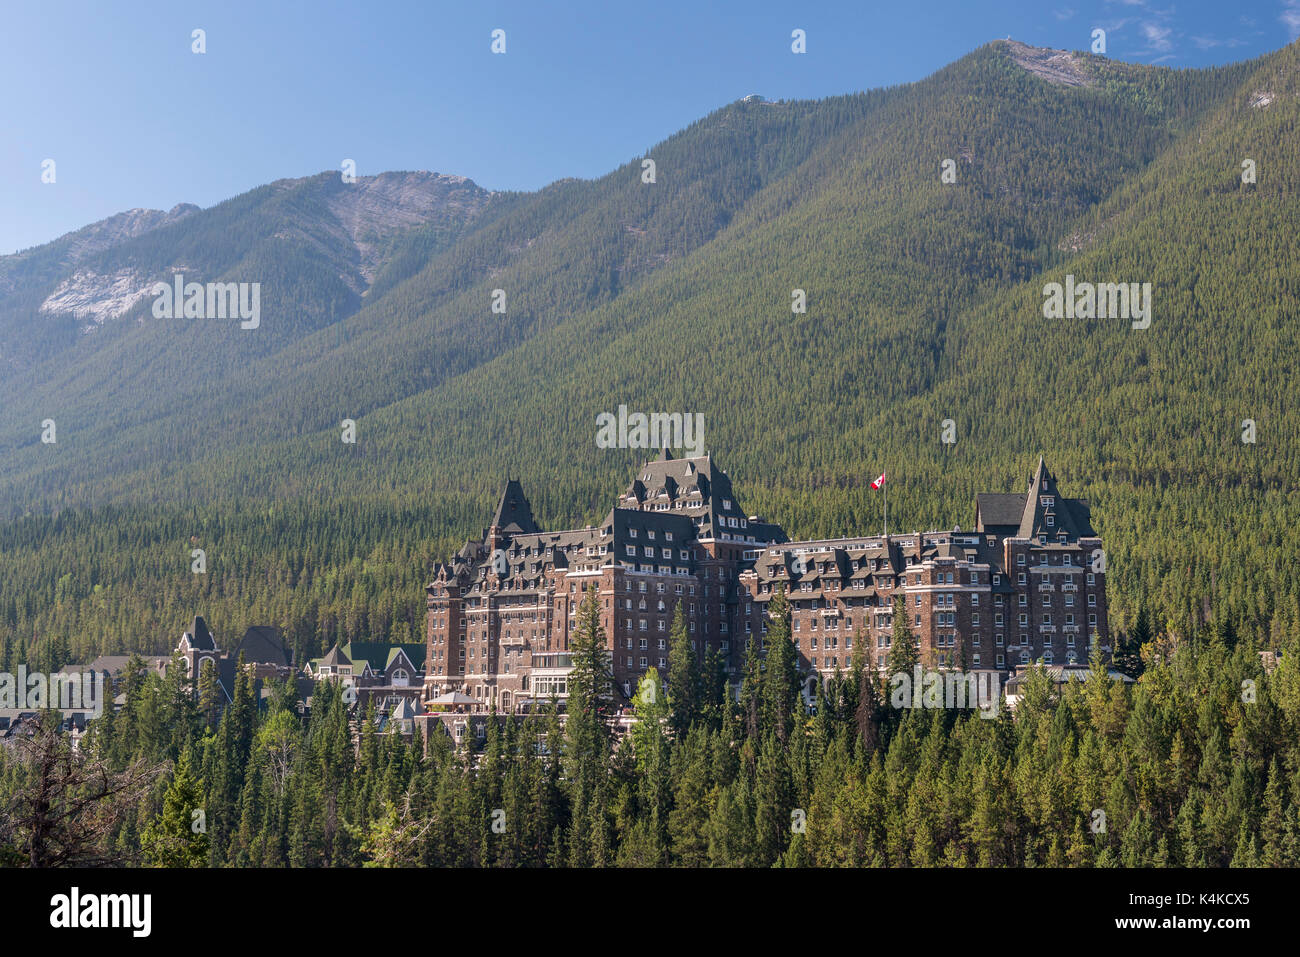 Fairmont Banff Springs Hotel, Banff, Alberta, Canada - Stock Image